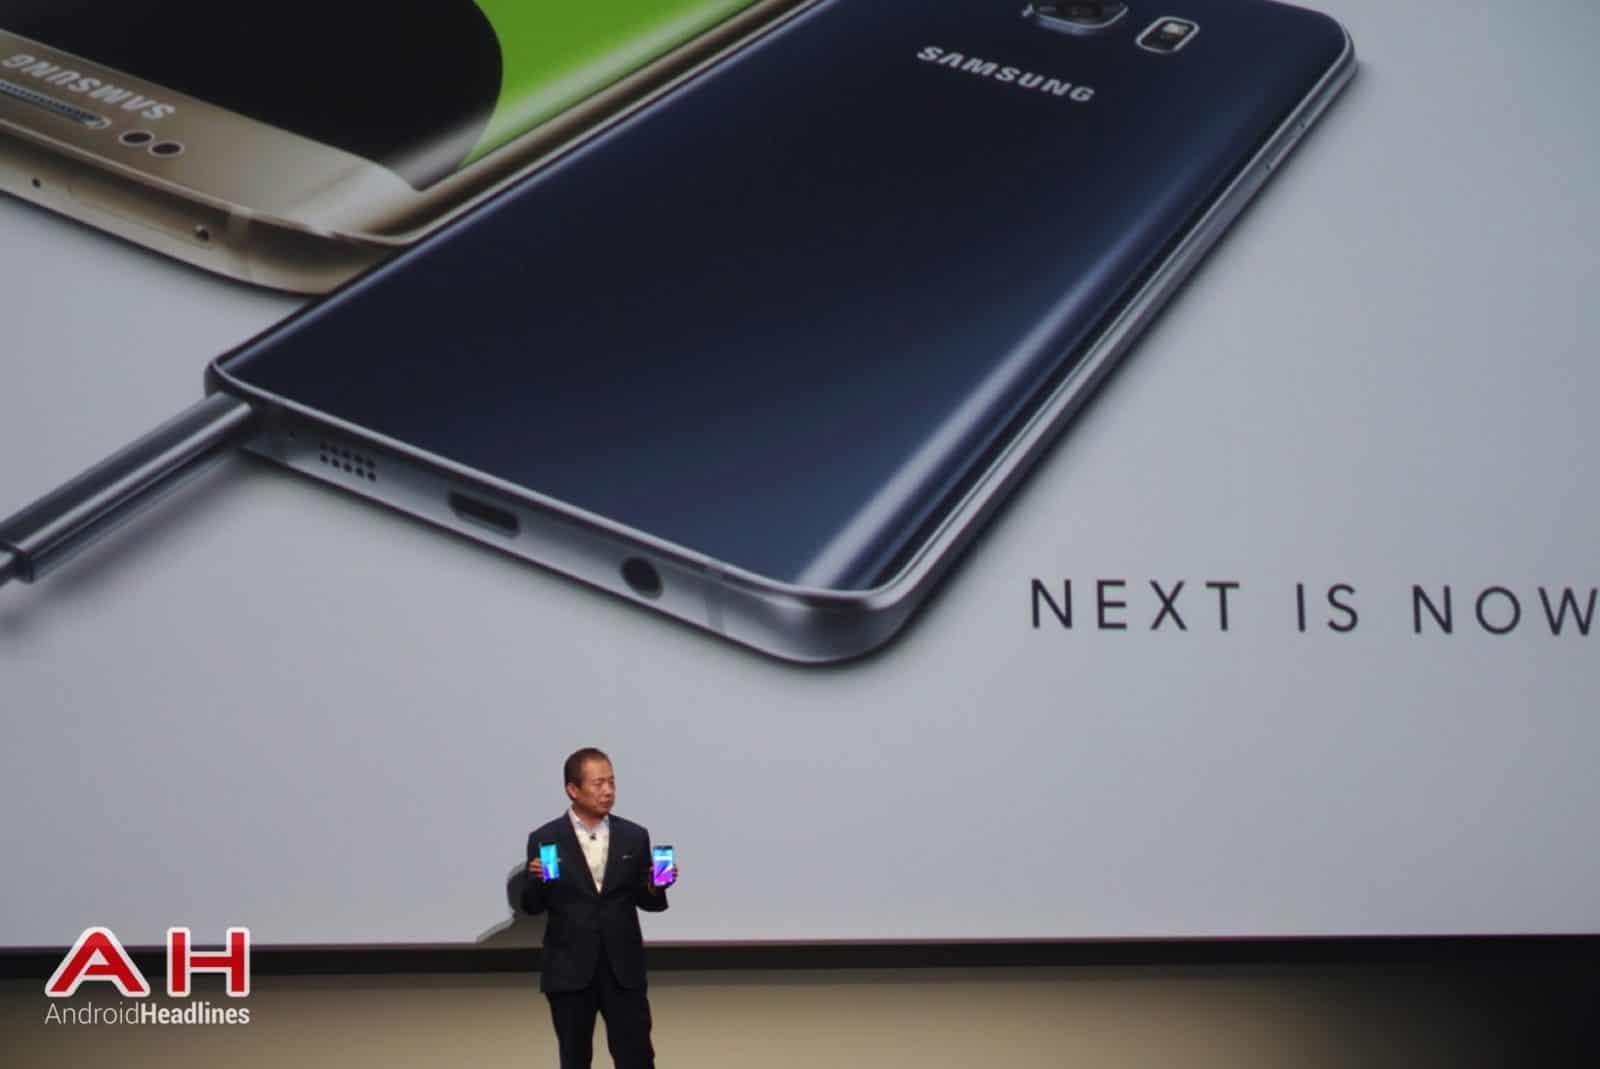 Samsung Unpacked 15 AH 16